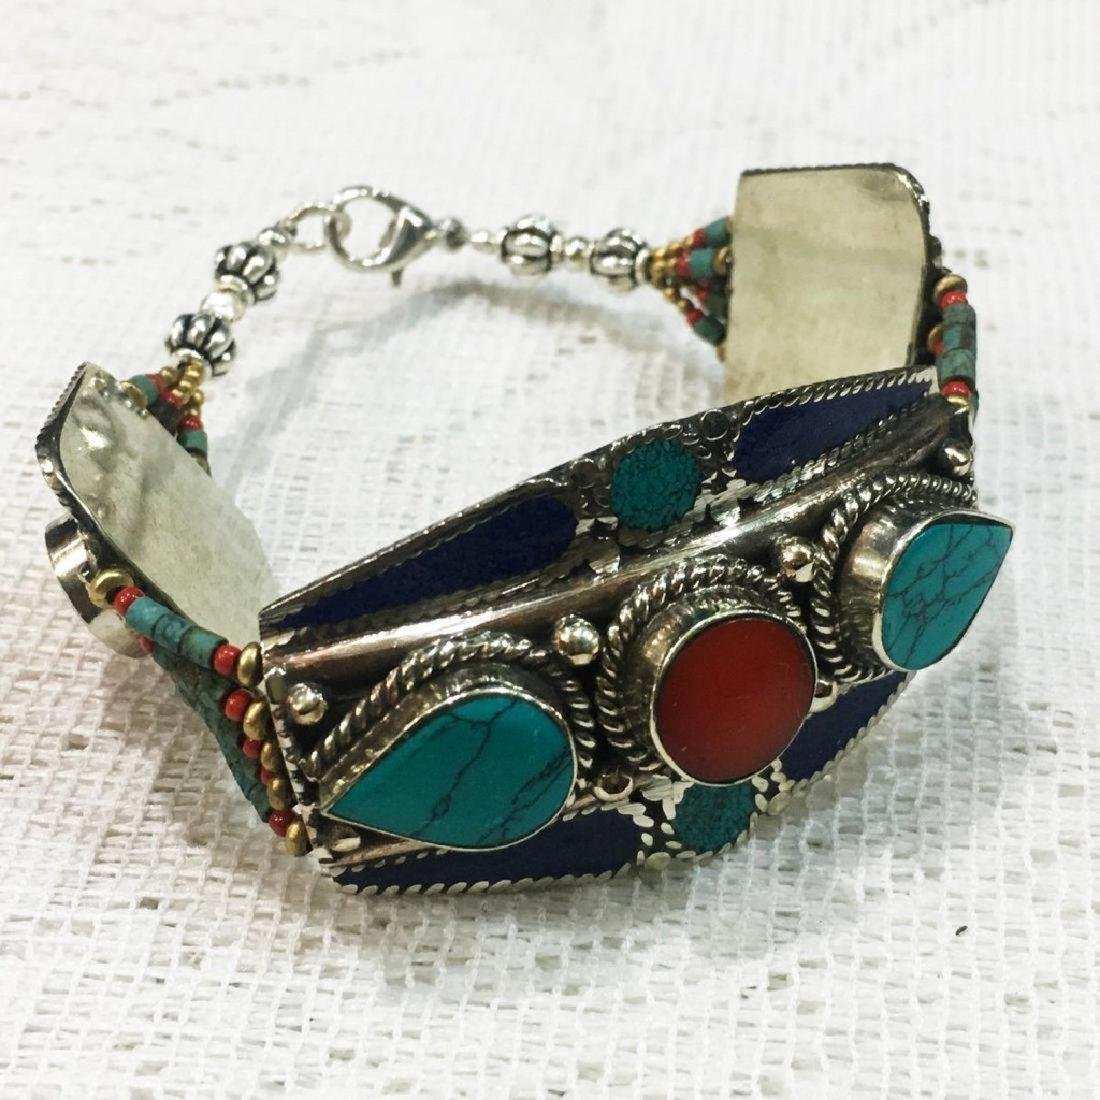 Tibetan Silver Handmade Turquoise & Coral Bracelet - 2